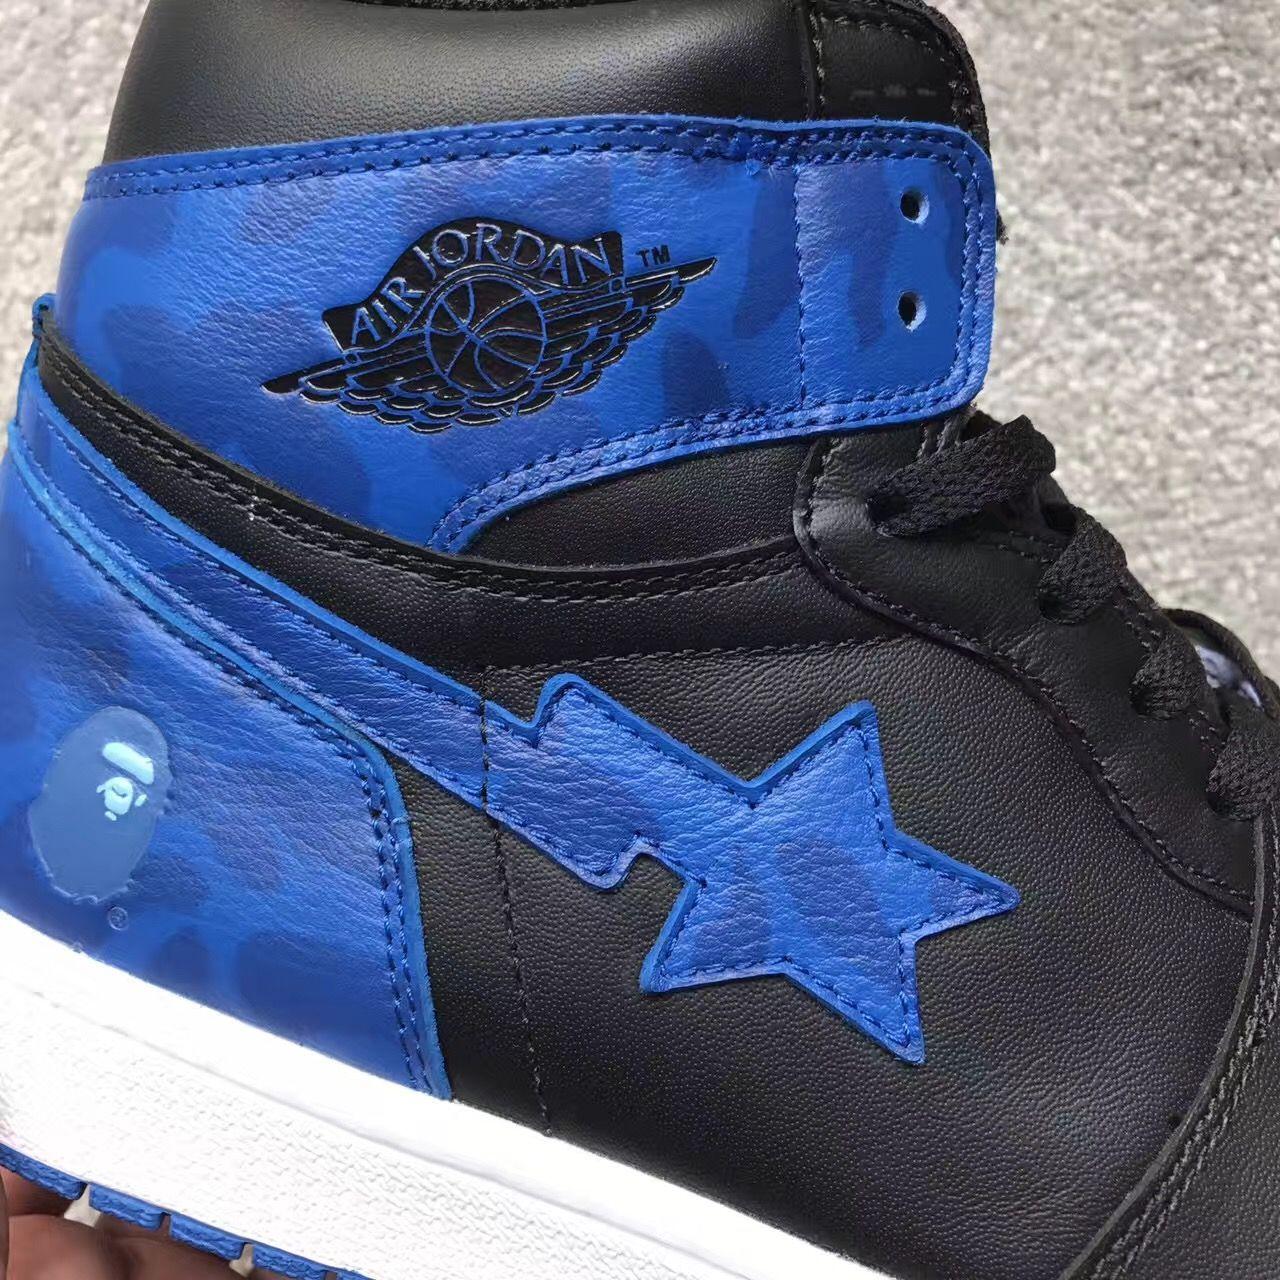 c26f2bc0053 Bape X Air Jordan 1 Royal? Customs, Fakes Or Another Frankenstein ...